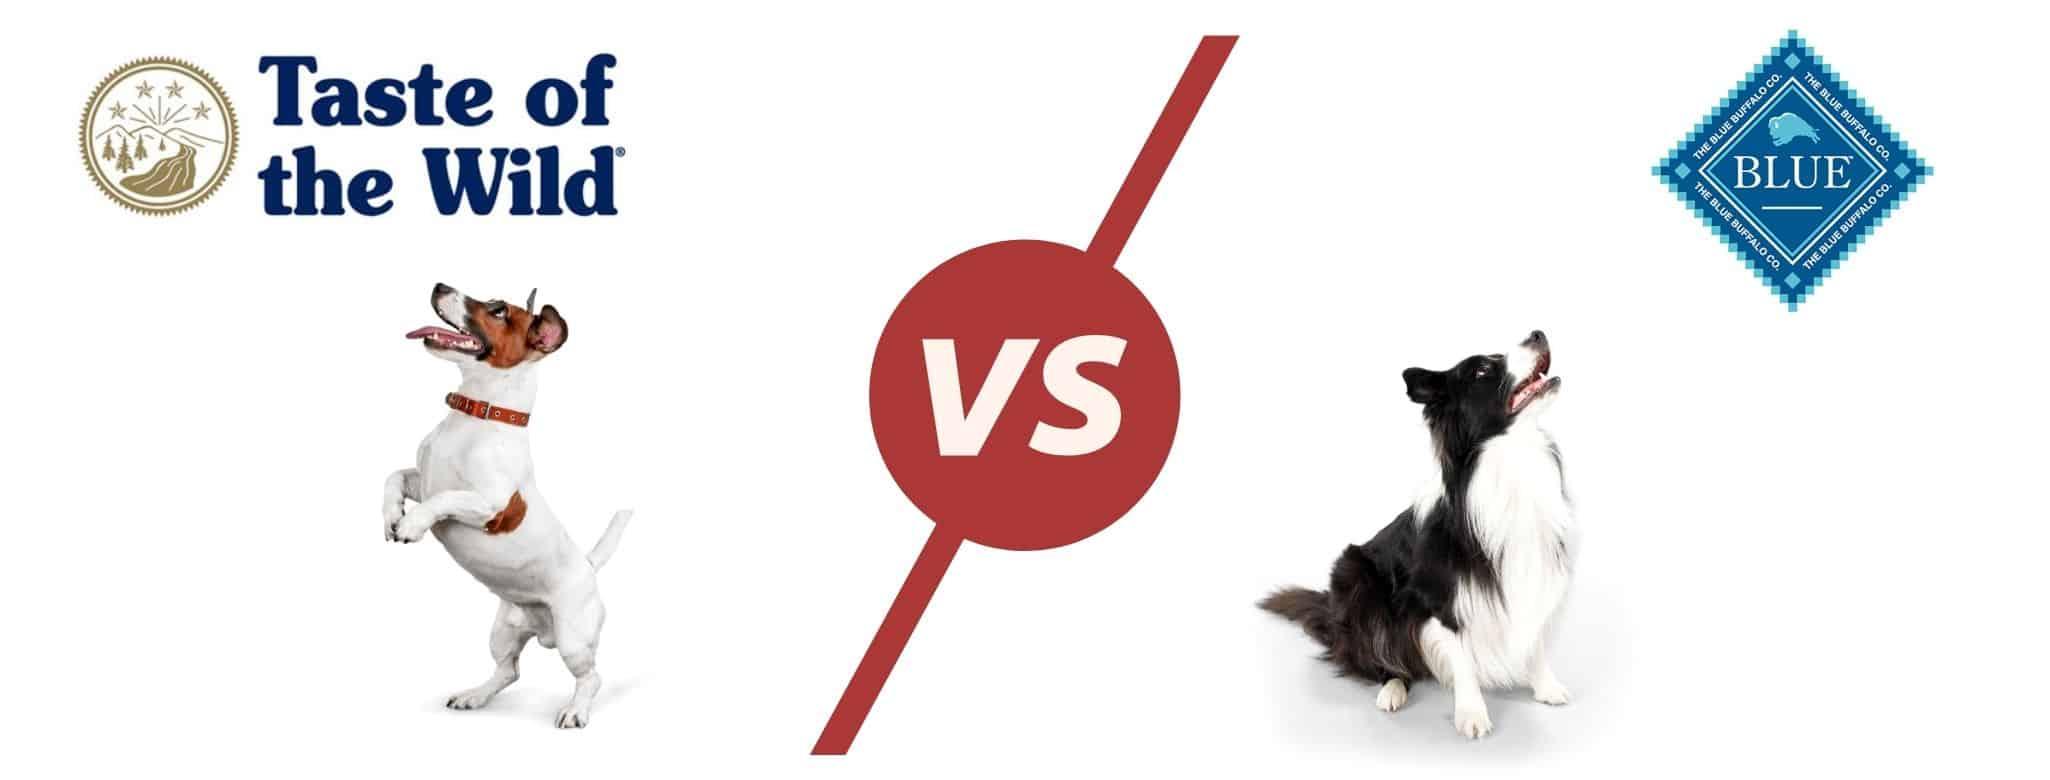 Taste of the wild vs Blue buffalo